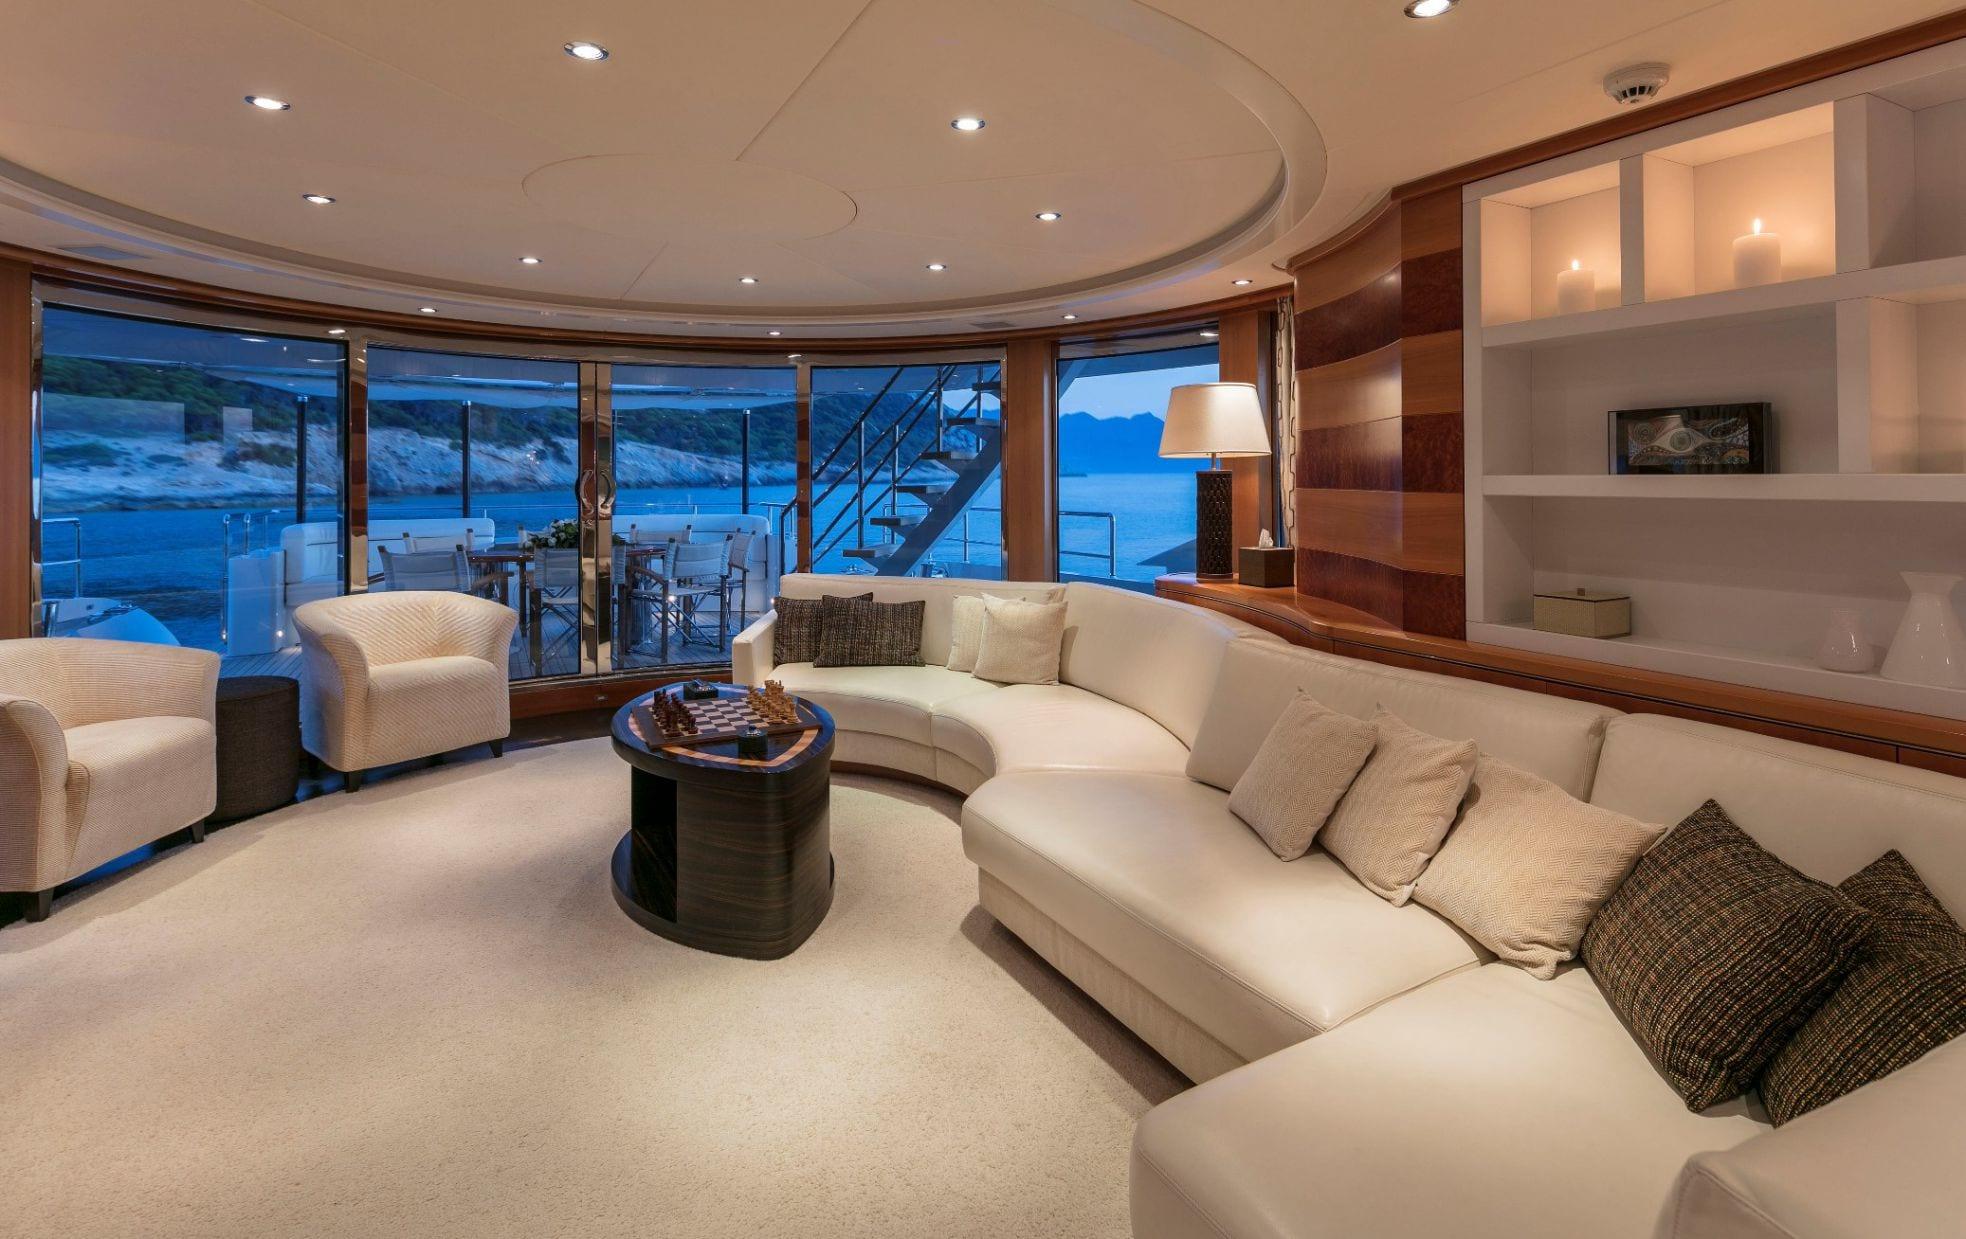 l_equinox salon (1)_valef -  Valef Yachts Chartering - 5491